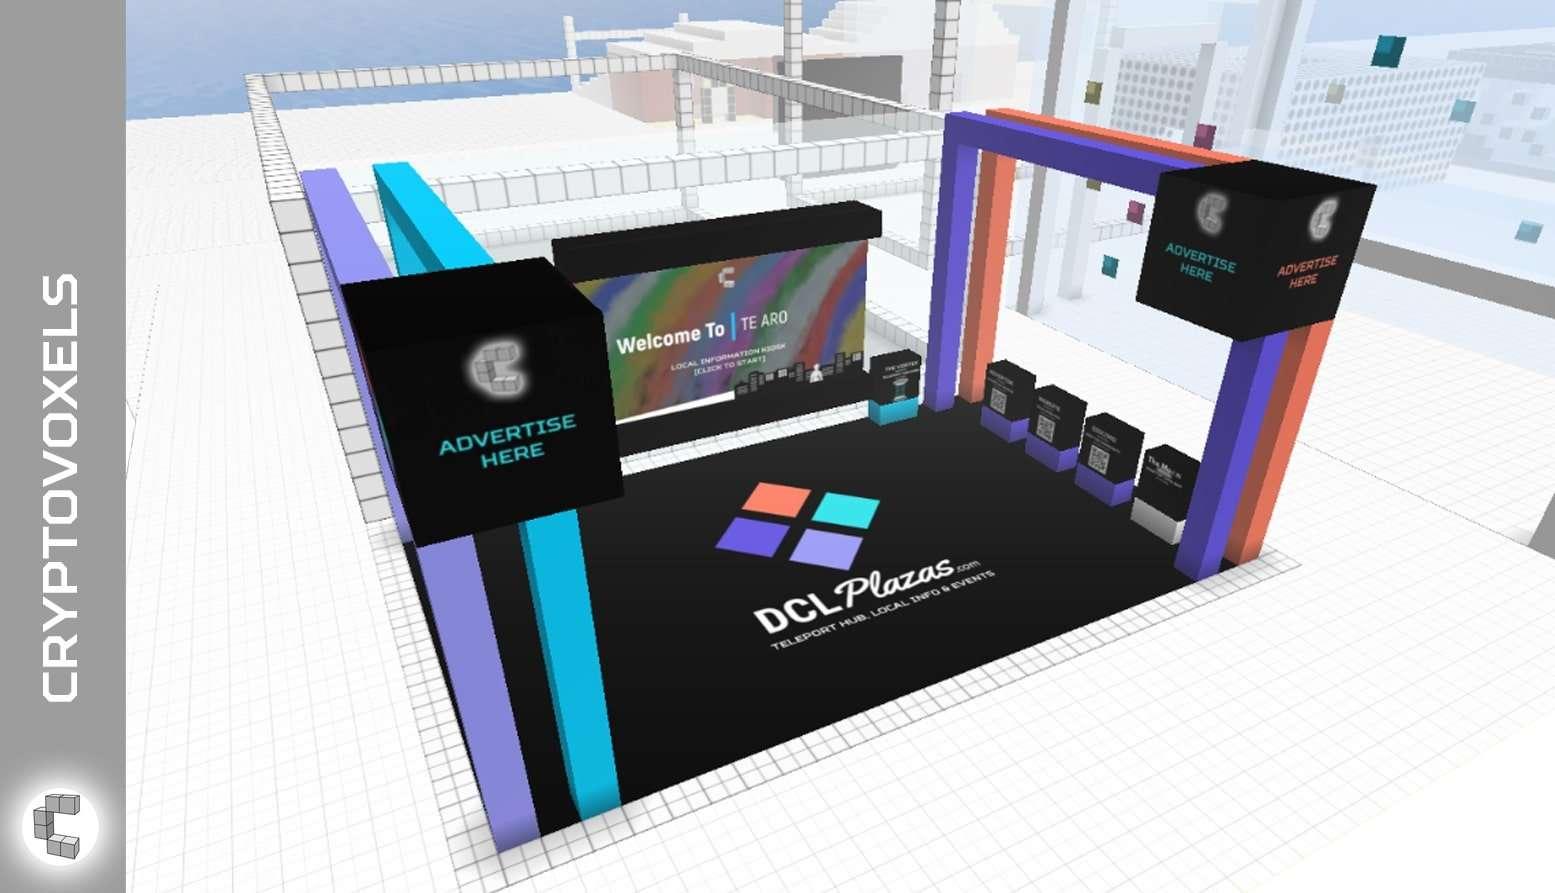 cryptovoxels dcl plazas model live